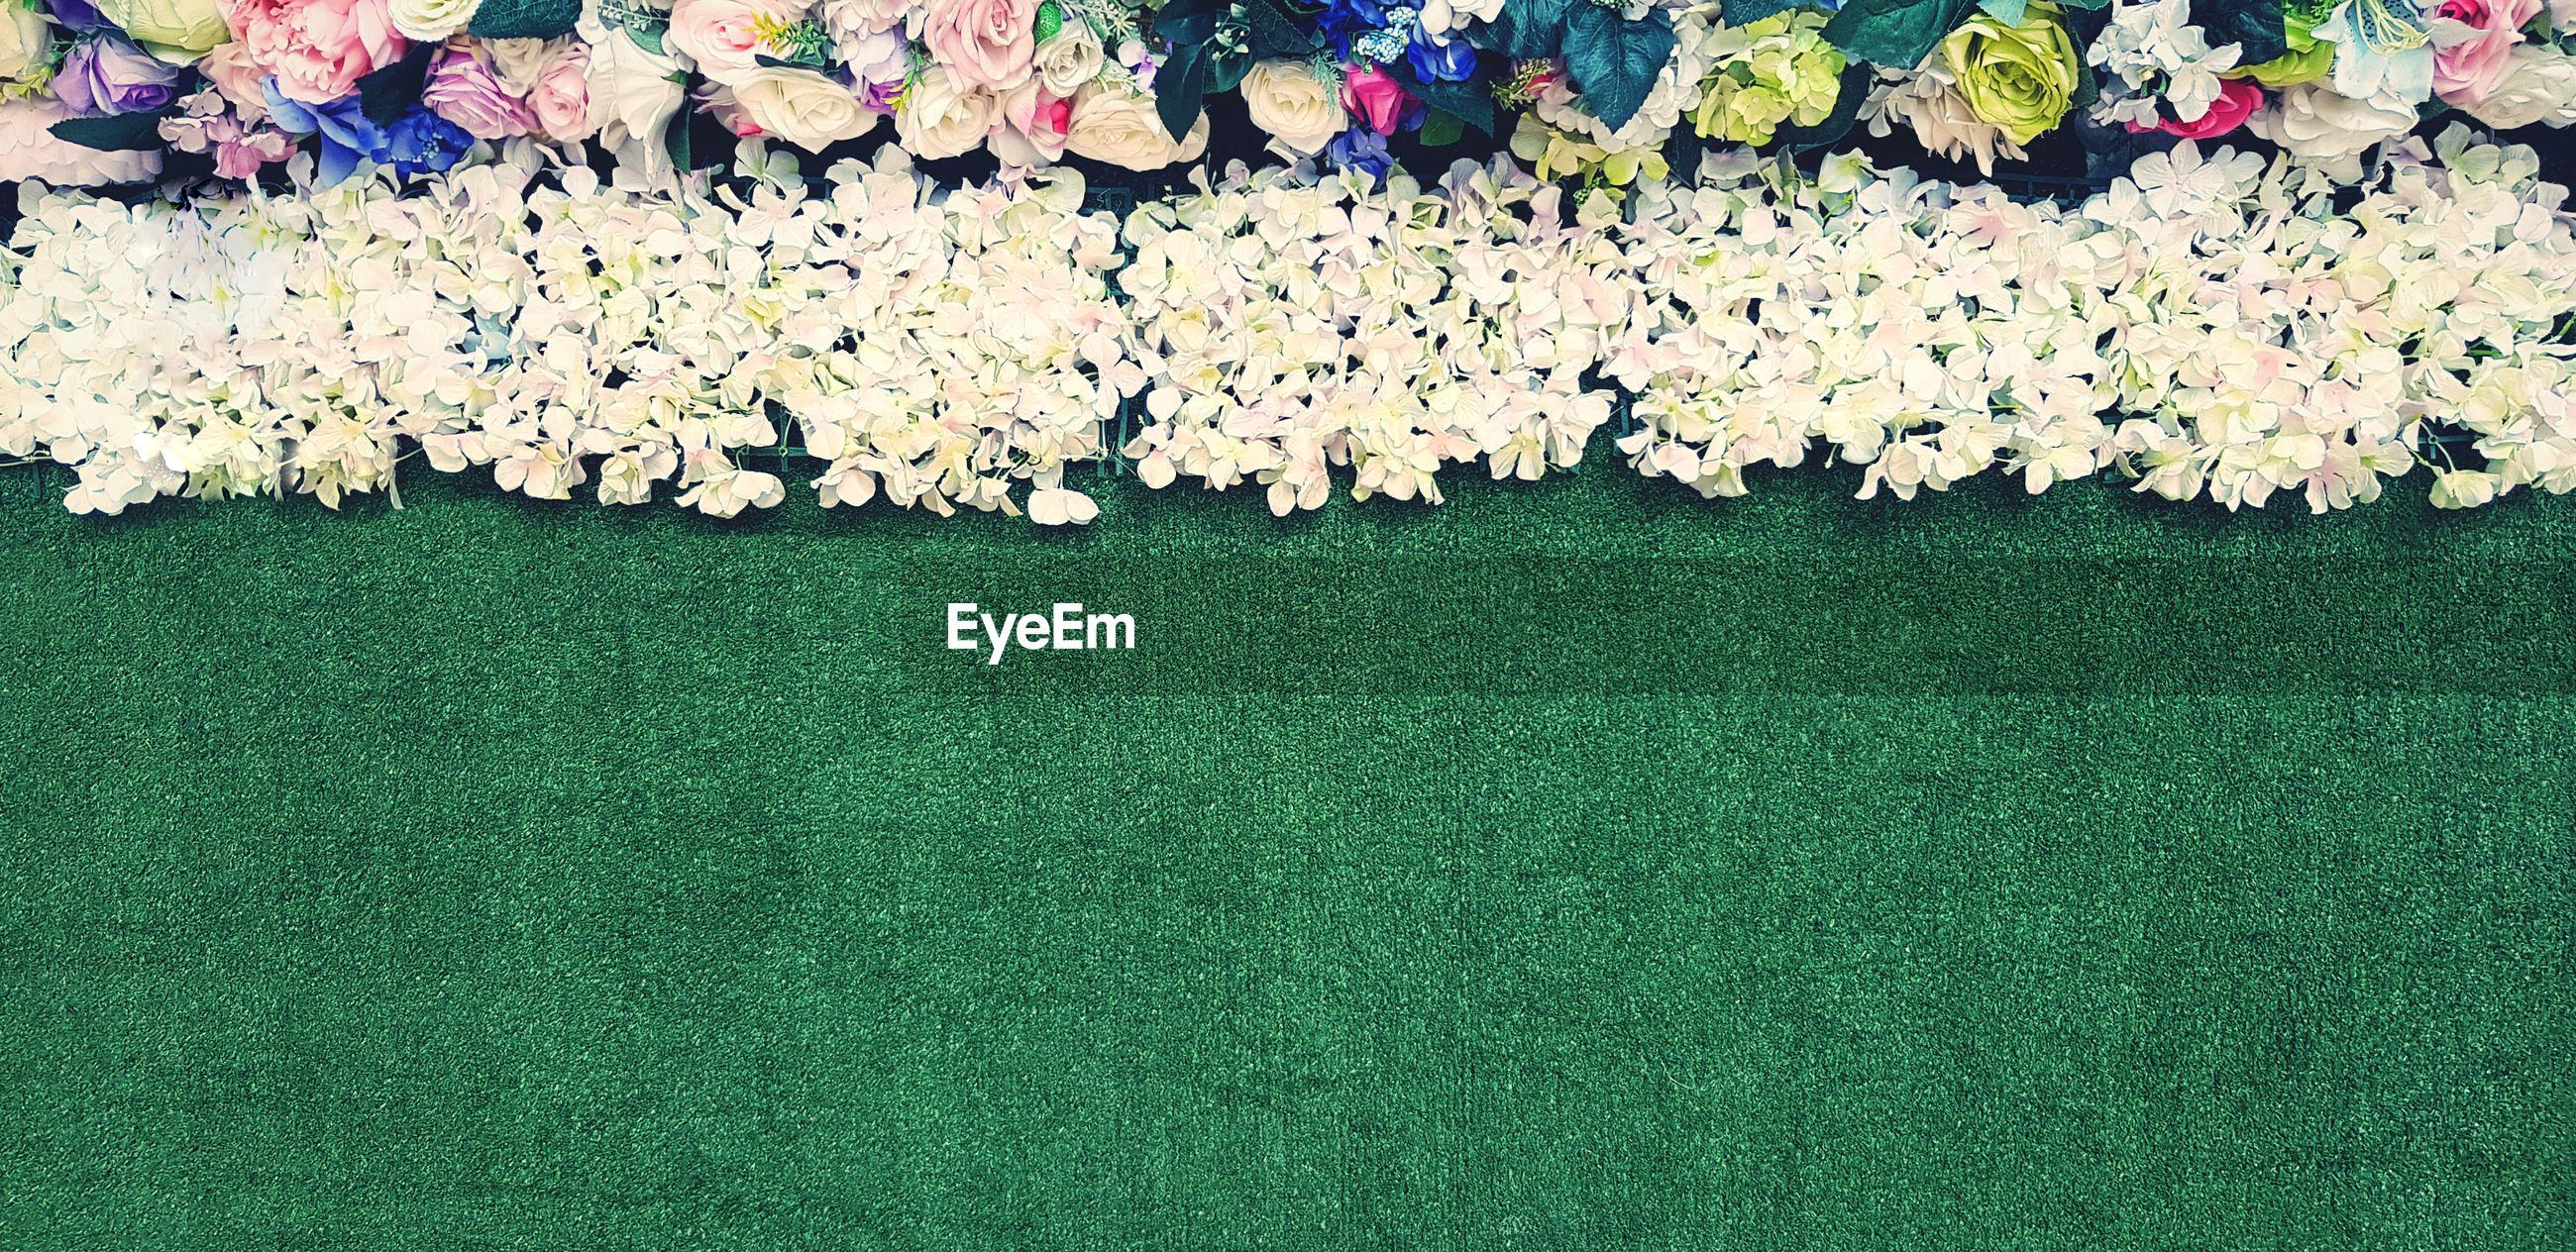 DIRECTLY BELOW SHOT OF WHITE FLOWERING PLANTS